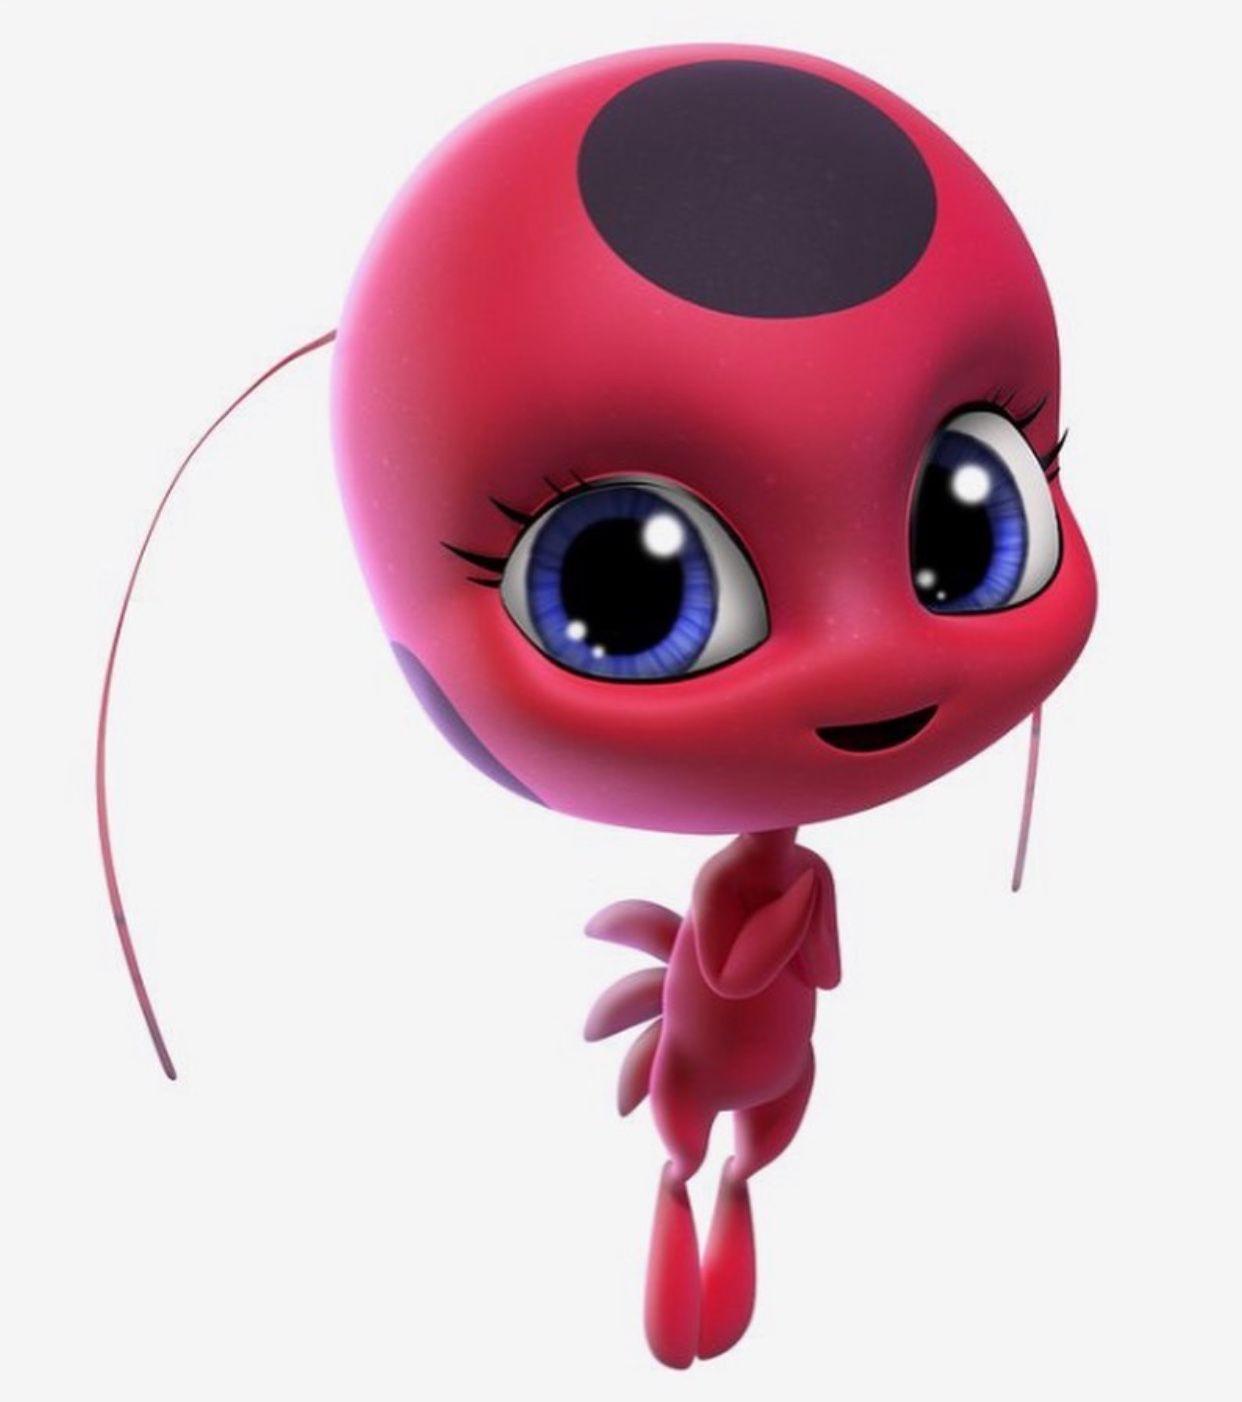 Pin By Asa On Imagenes Disney Miraculous Ladybug Anime Miraculous Ladybug Comic Miraclous Ladybug